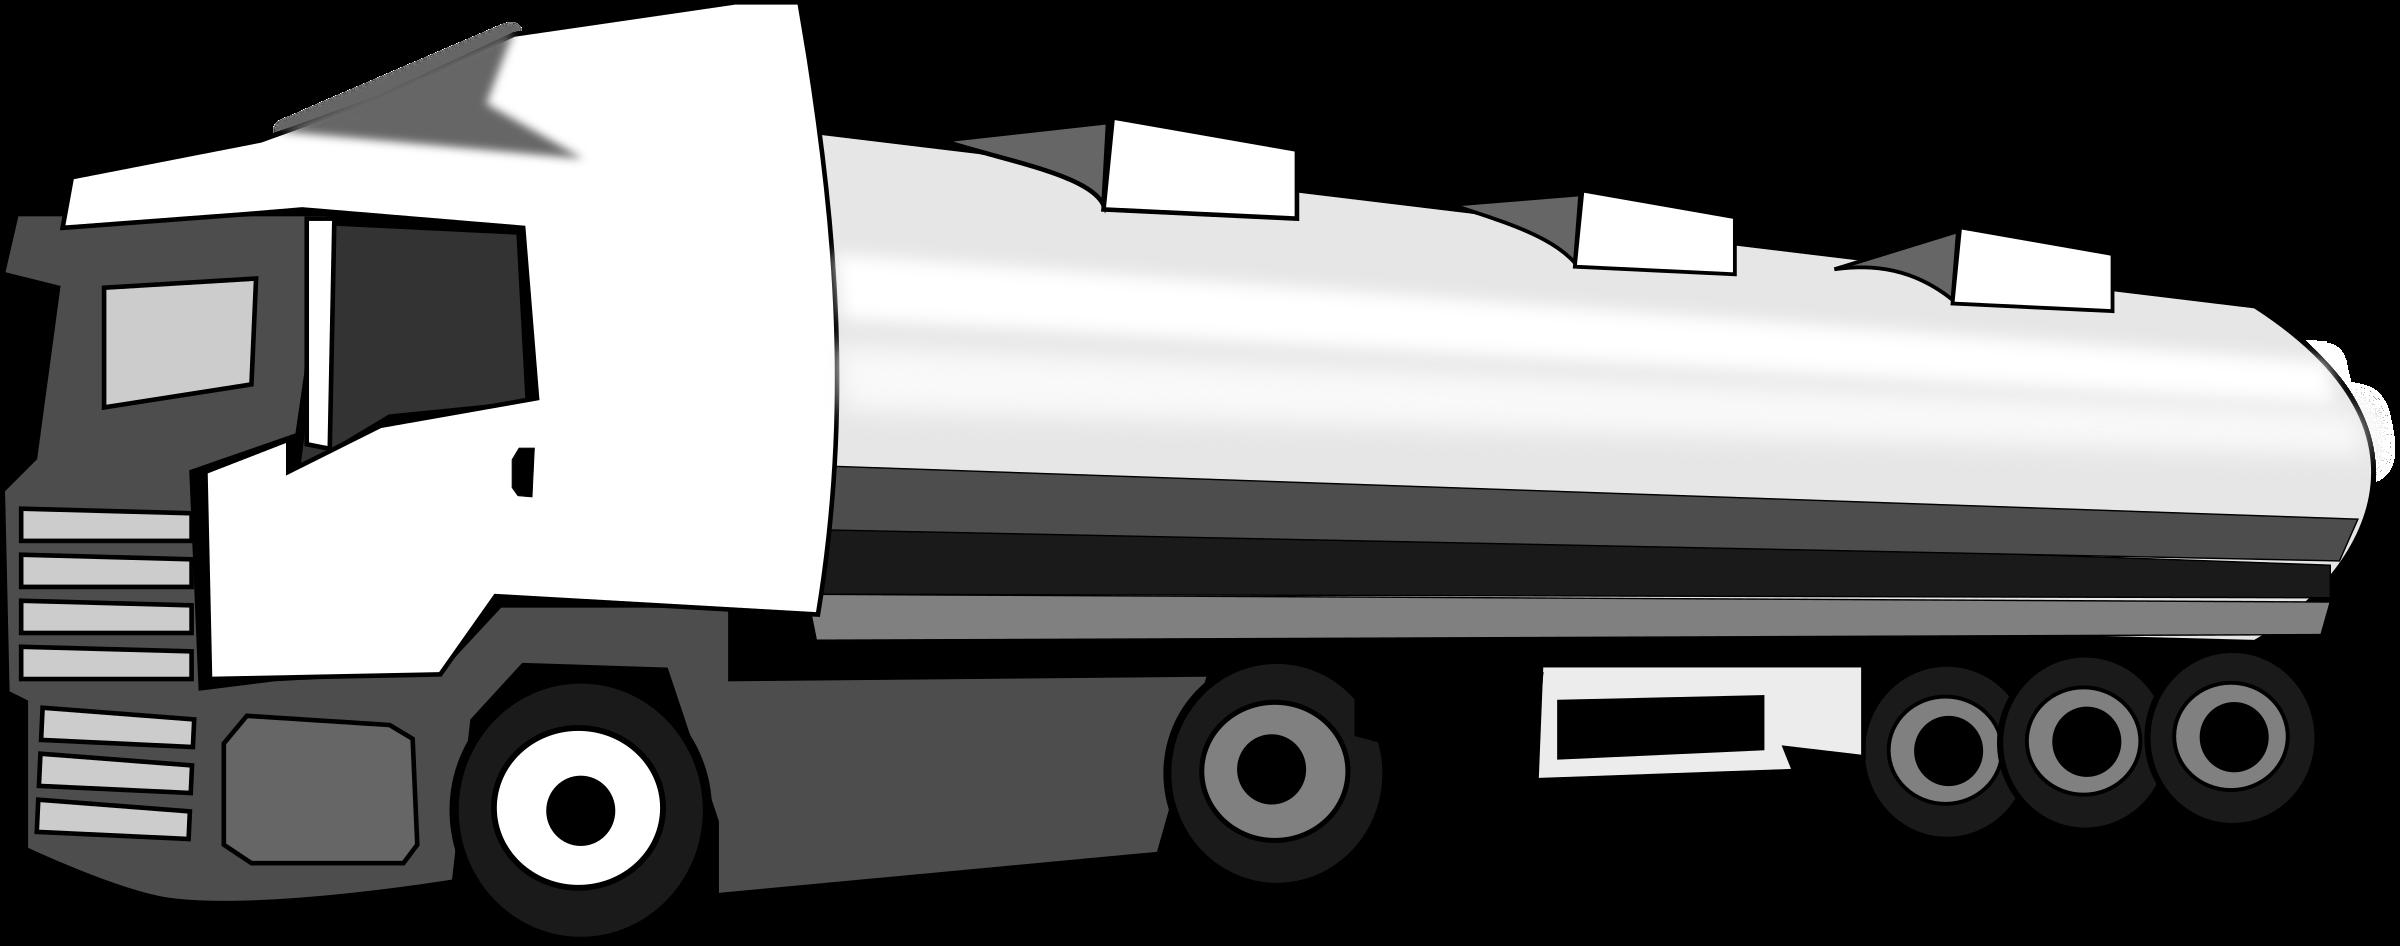 Tanker clipart #5, Download drawings